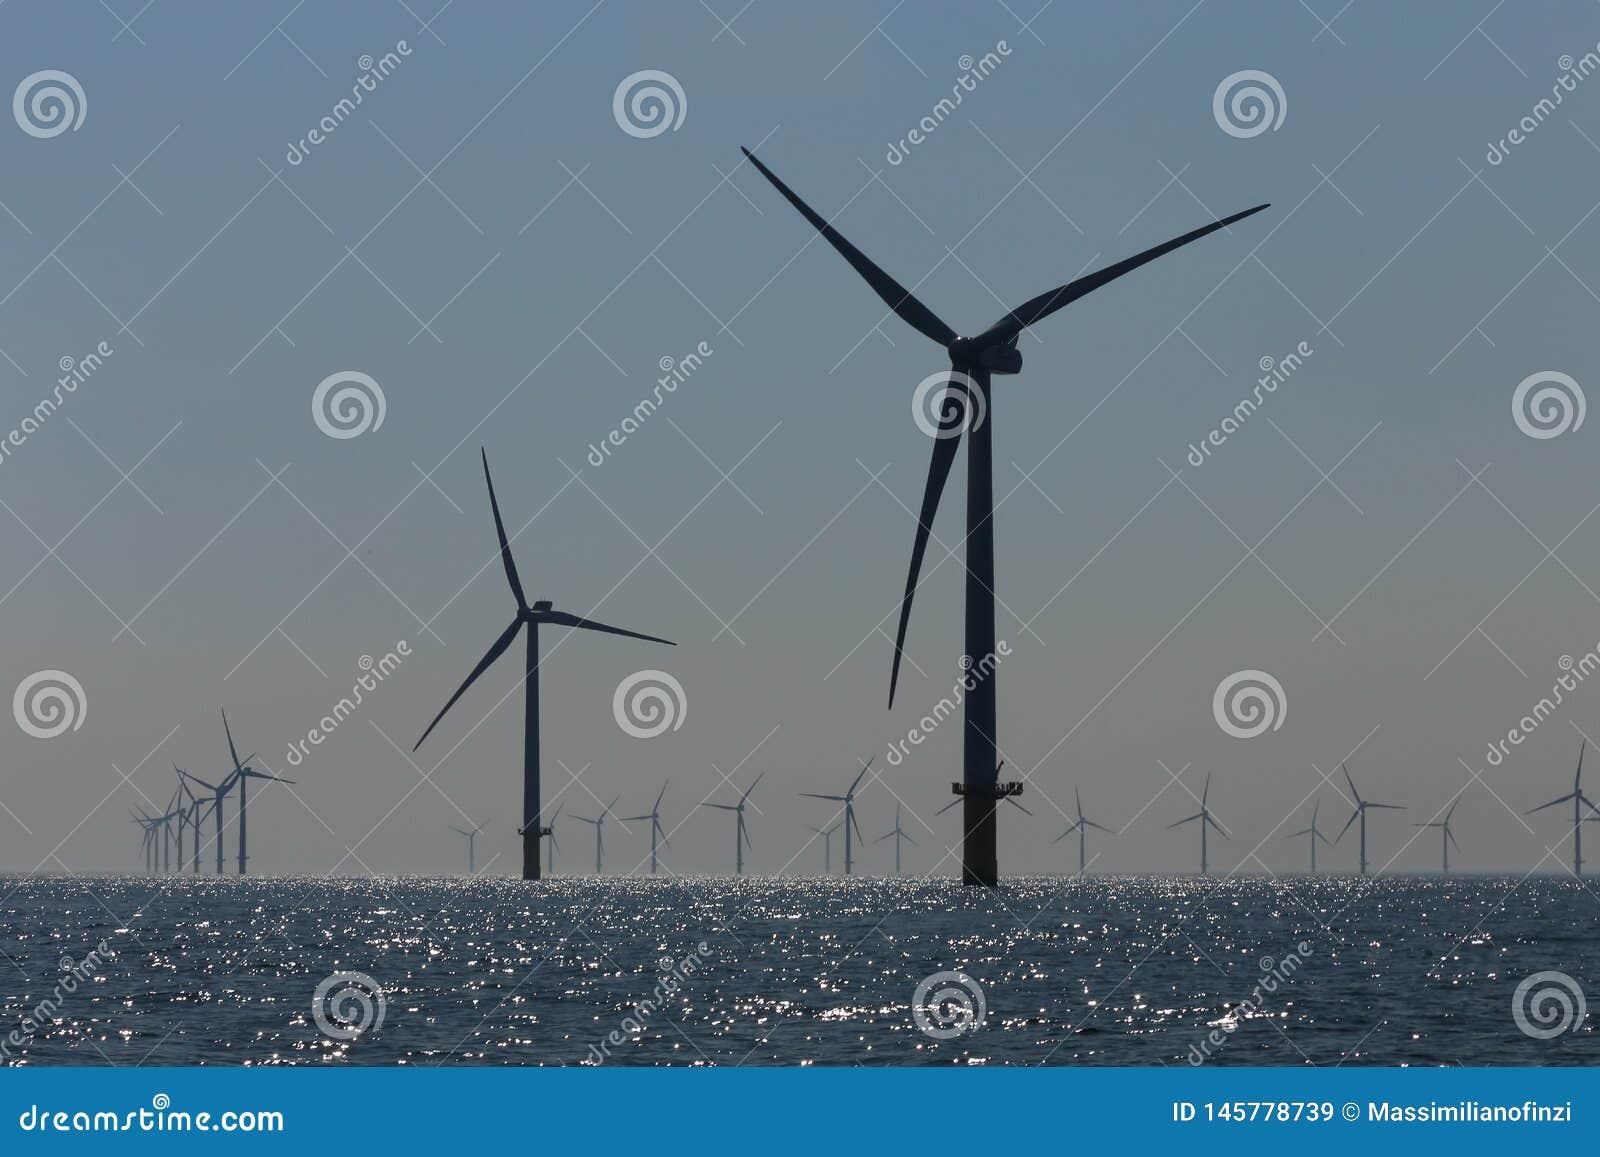 Rampion windfarm近海平台风车在离布赖顿的附近,苏克塞斯,英国海岸